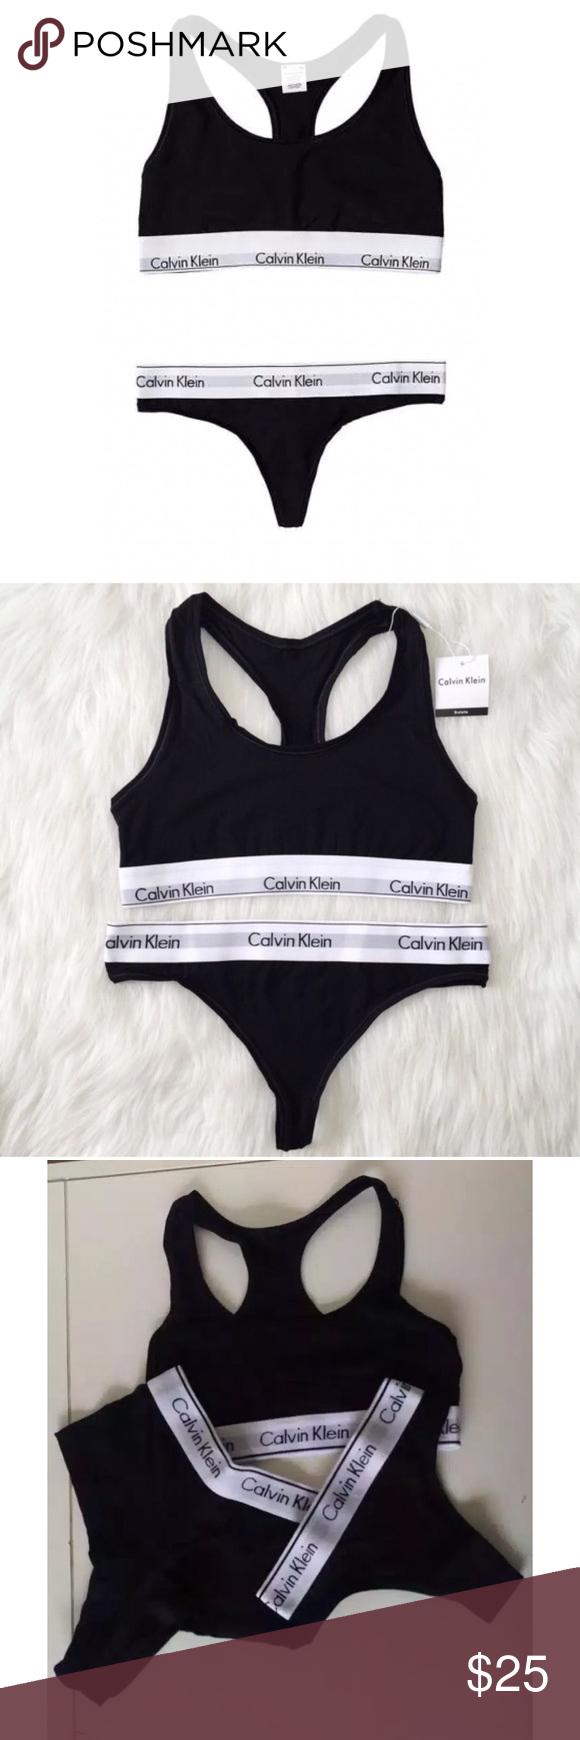 ca8e51f874ef Calvin Klein Womens Sports Bra Top 3pack Calvin Klein Womens Sports Bra  Top, Thong,